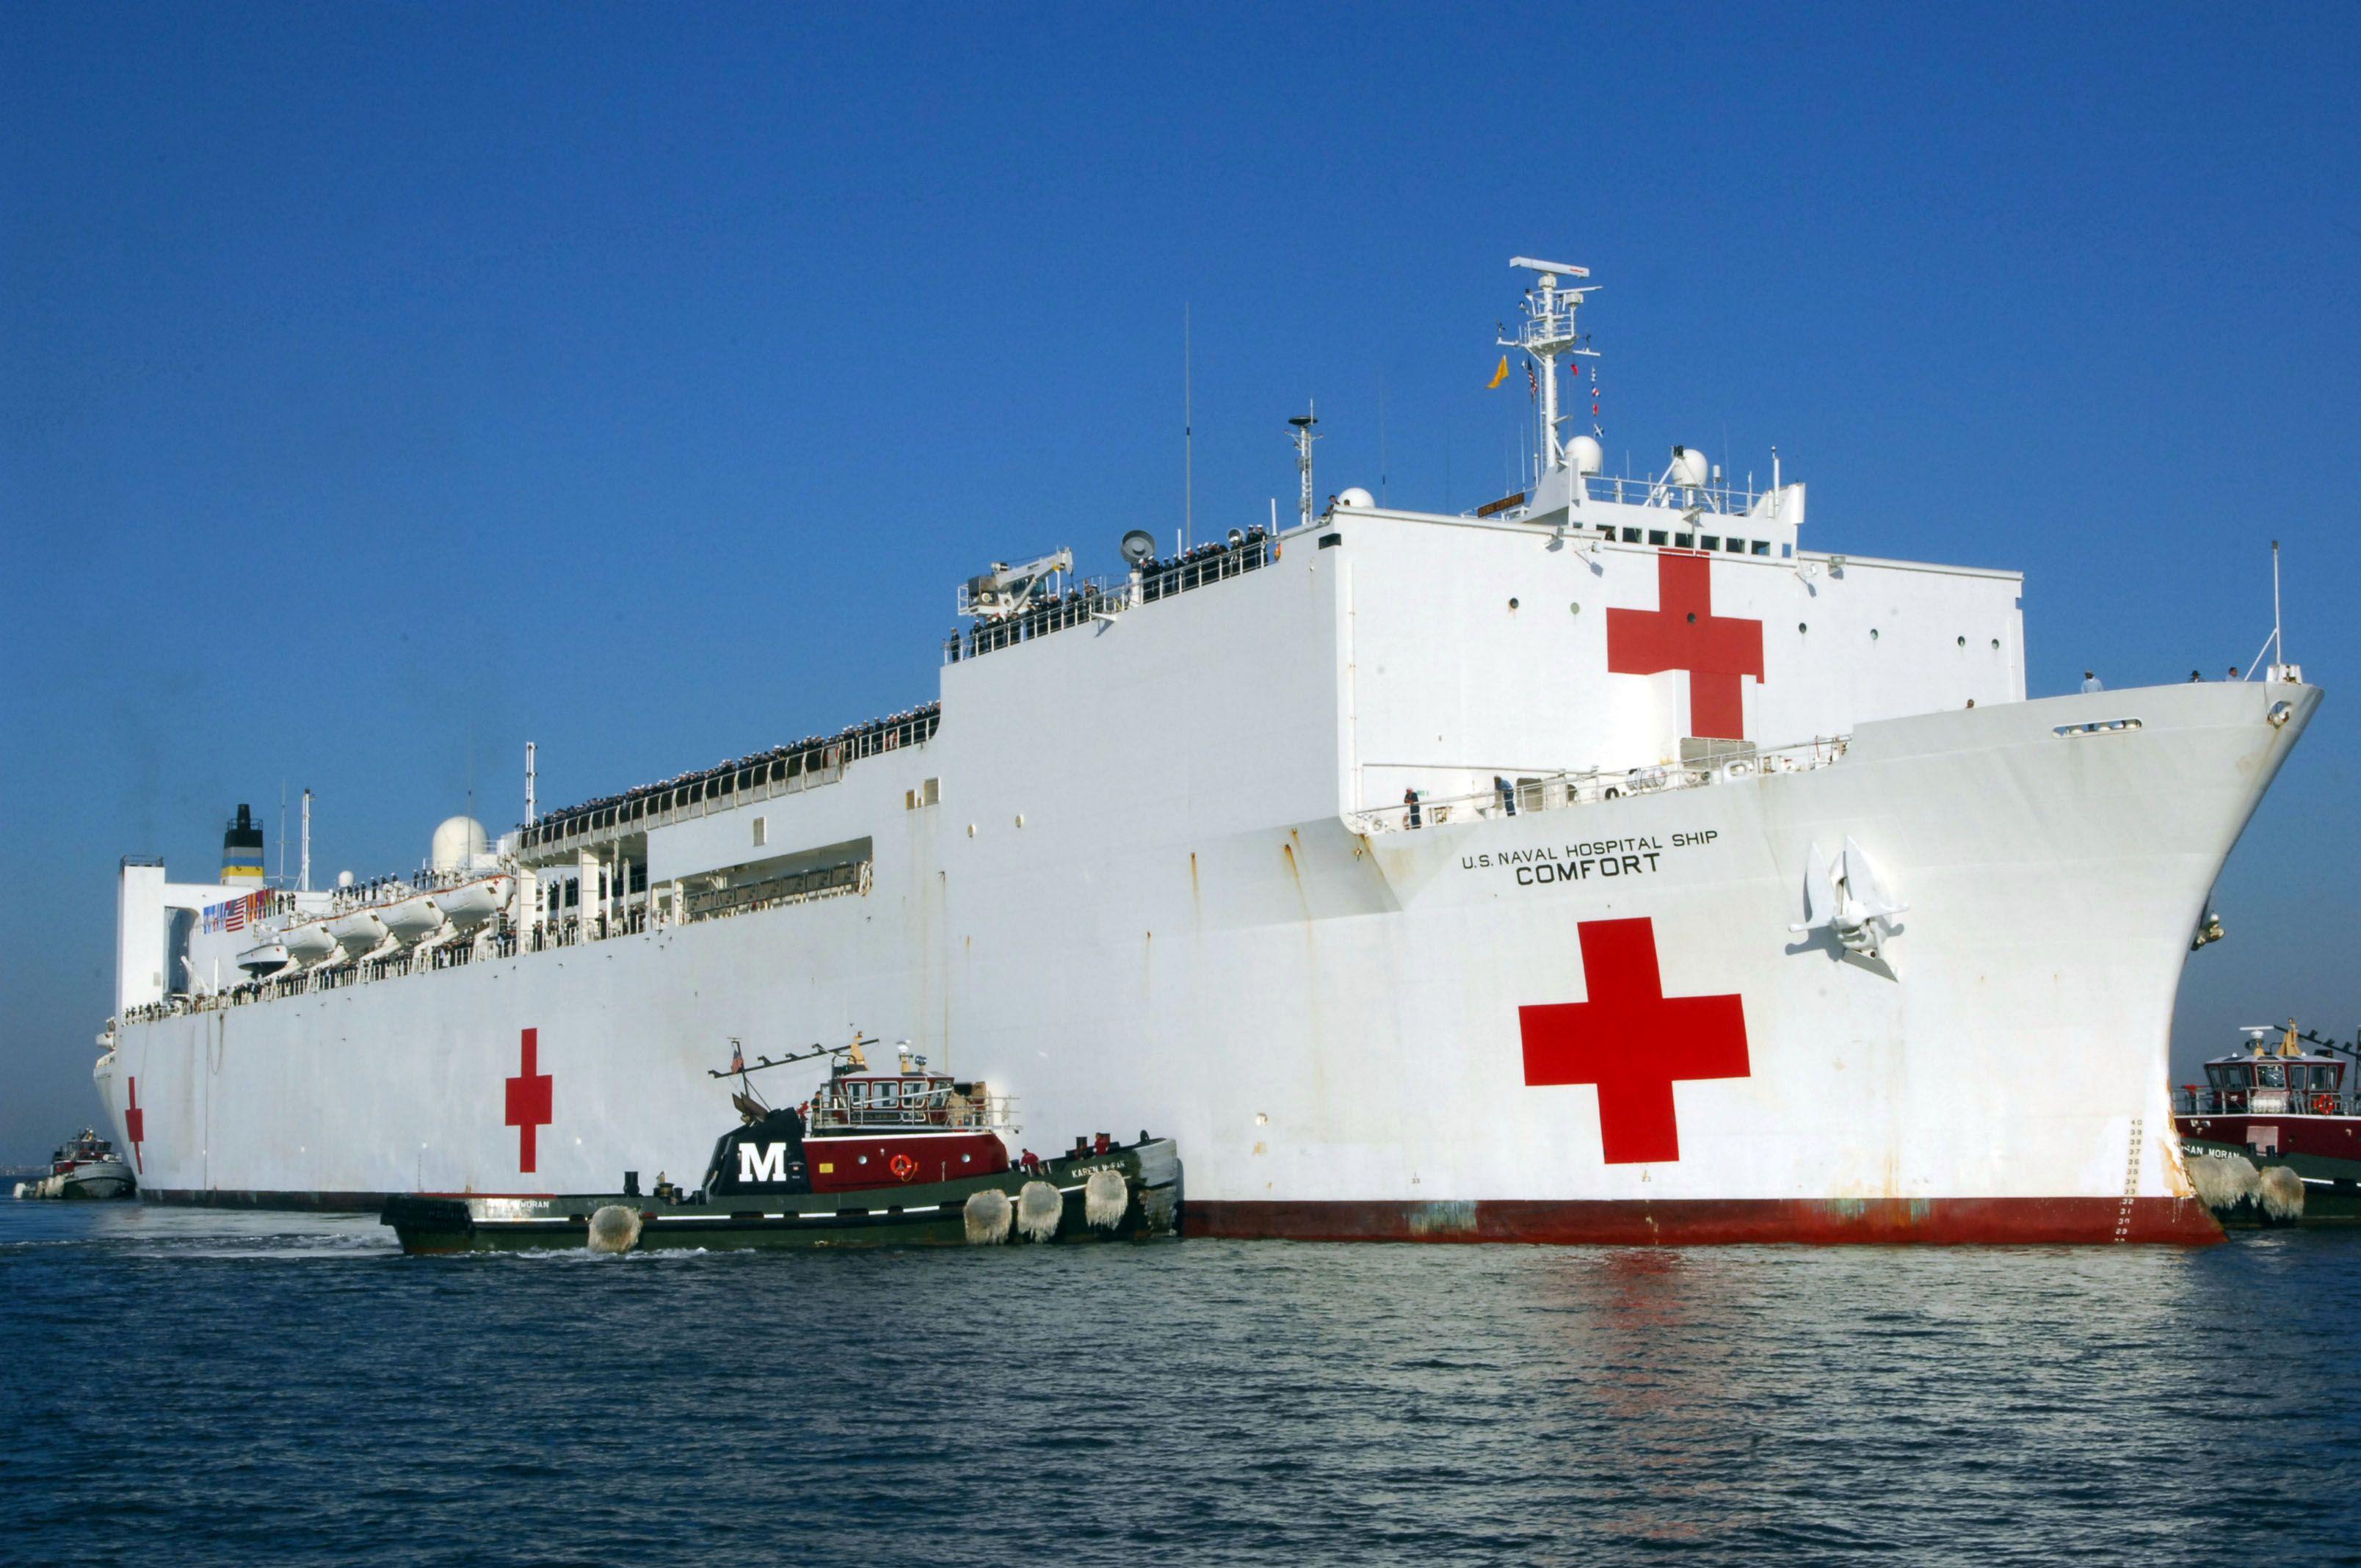 Uss Comfort Hospital Ship Us Navy Ships Navy Ships Boat